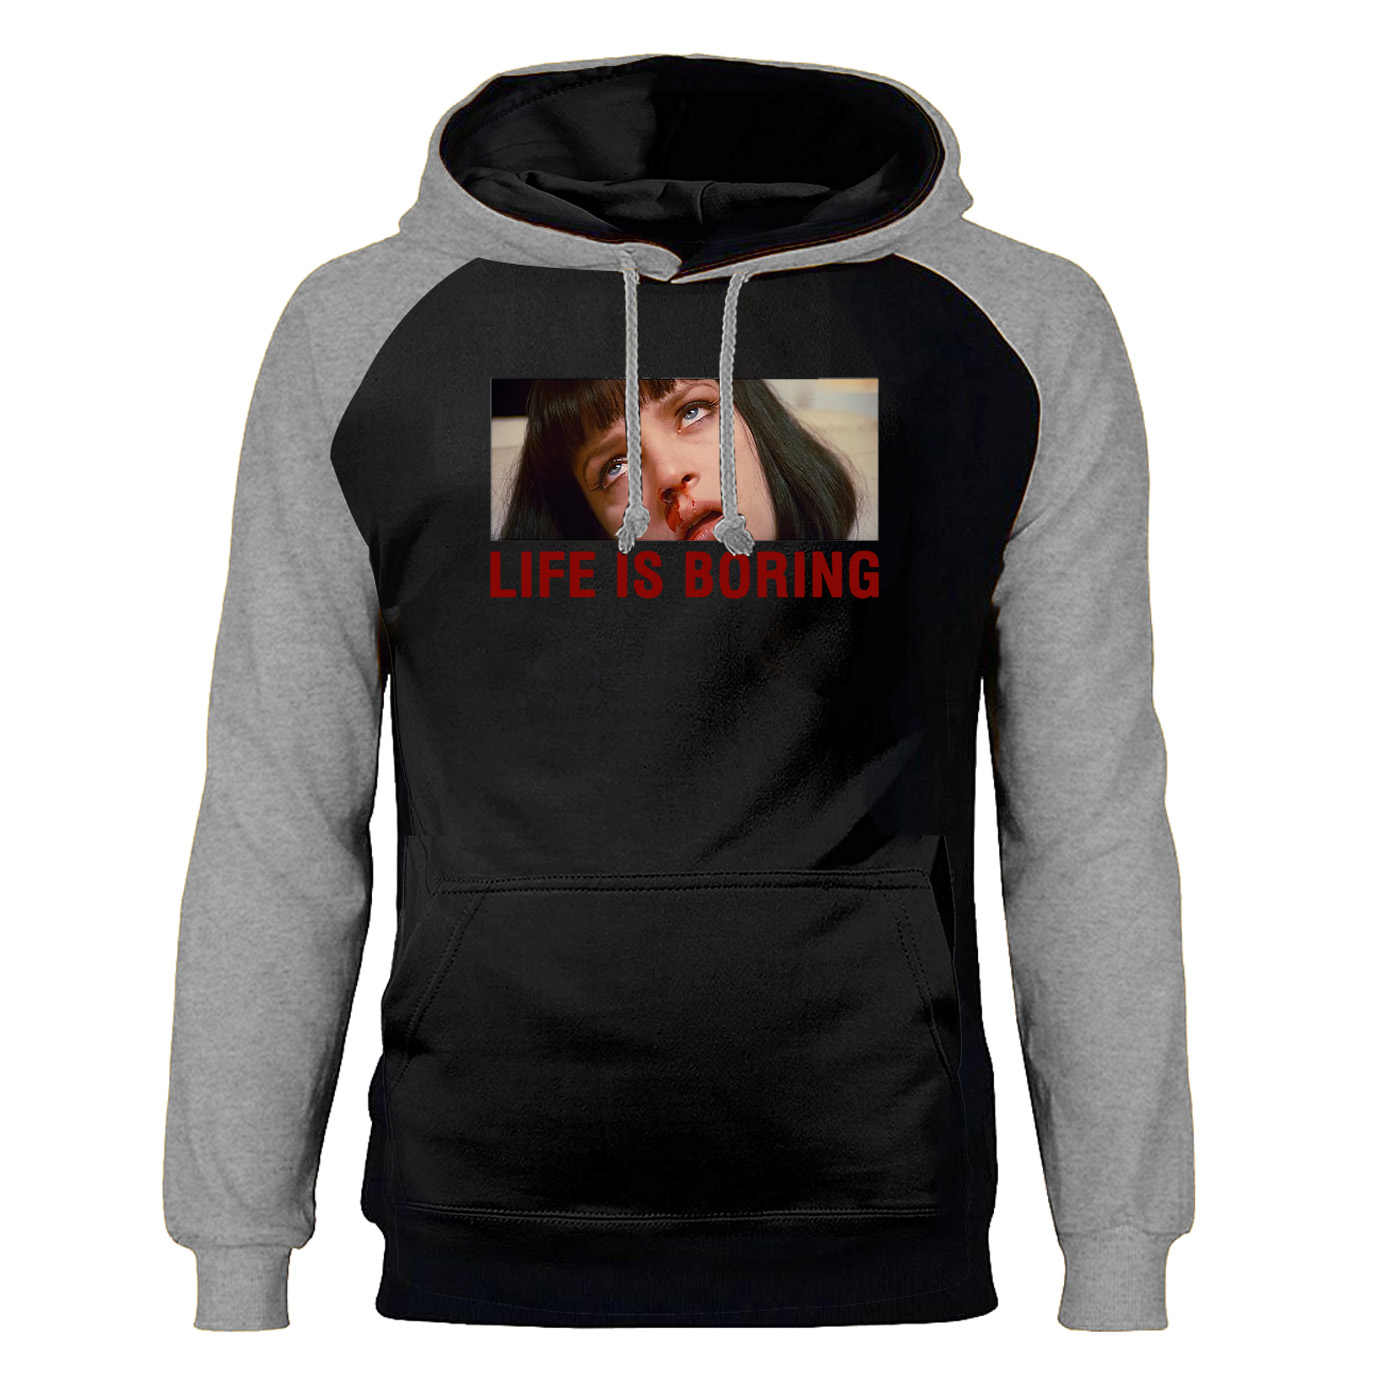 Leon Leben Ist Langweilig Hoodies Sweatshirts Männer Lustige Classic Movie Raglan Mit Kapuze Winter Herbst Fleece Warme Hoodie Streetwear Herren